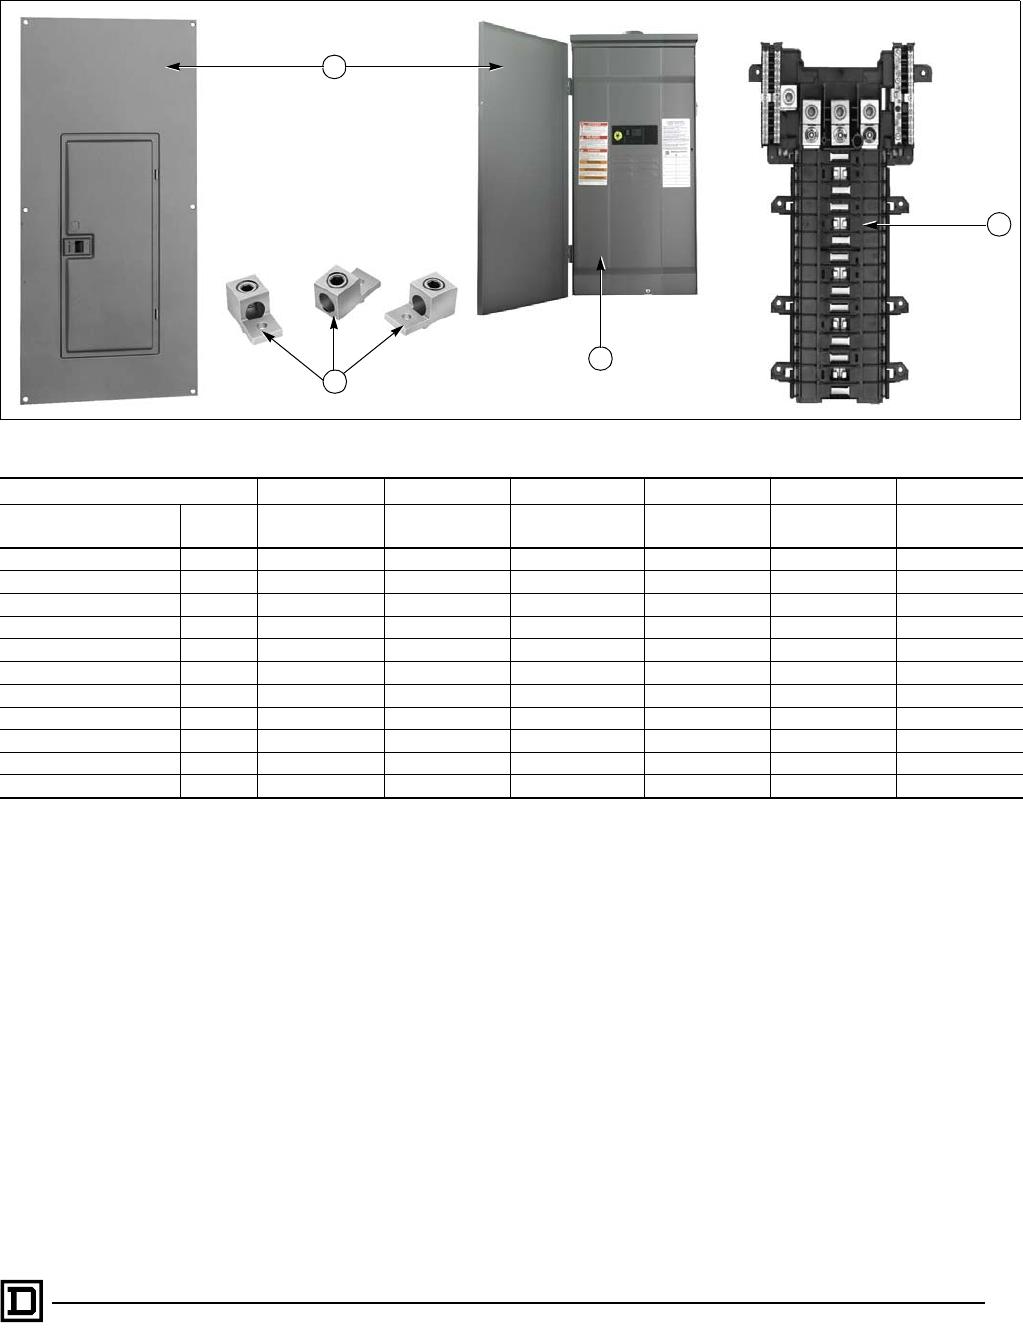 Qoc24u Load Center Wiring Diagram Installation 30a Schematic Diagrams On Parts